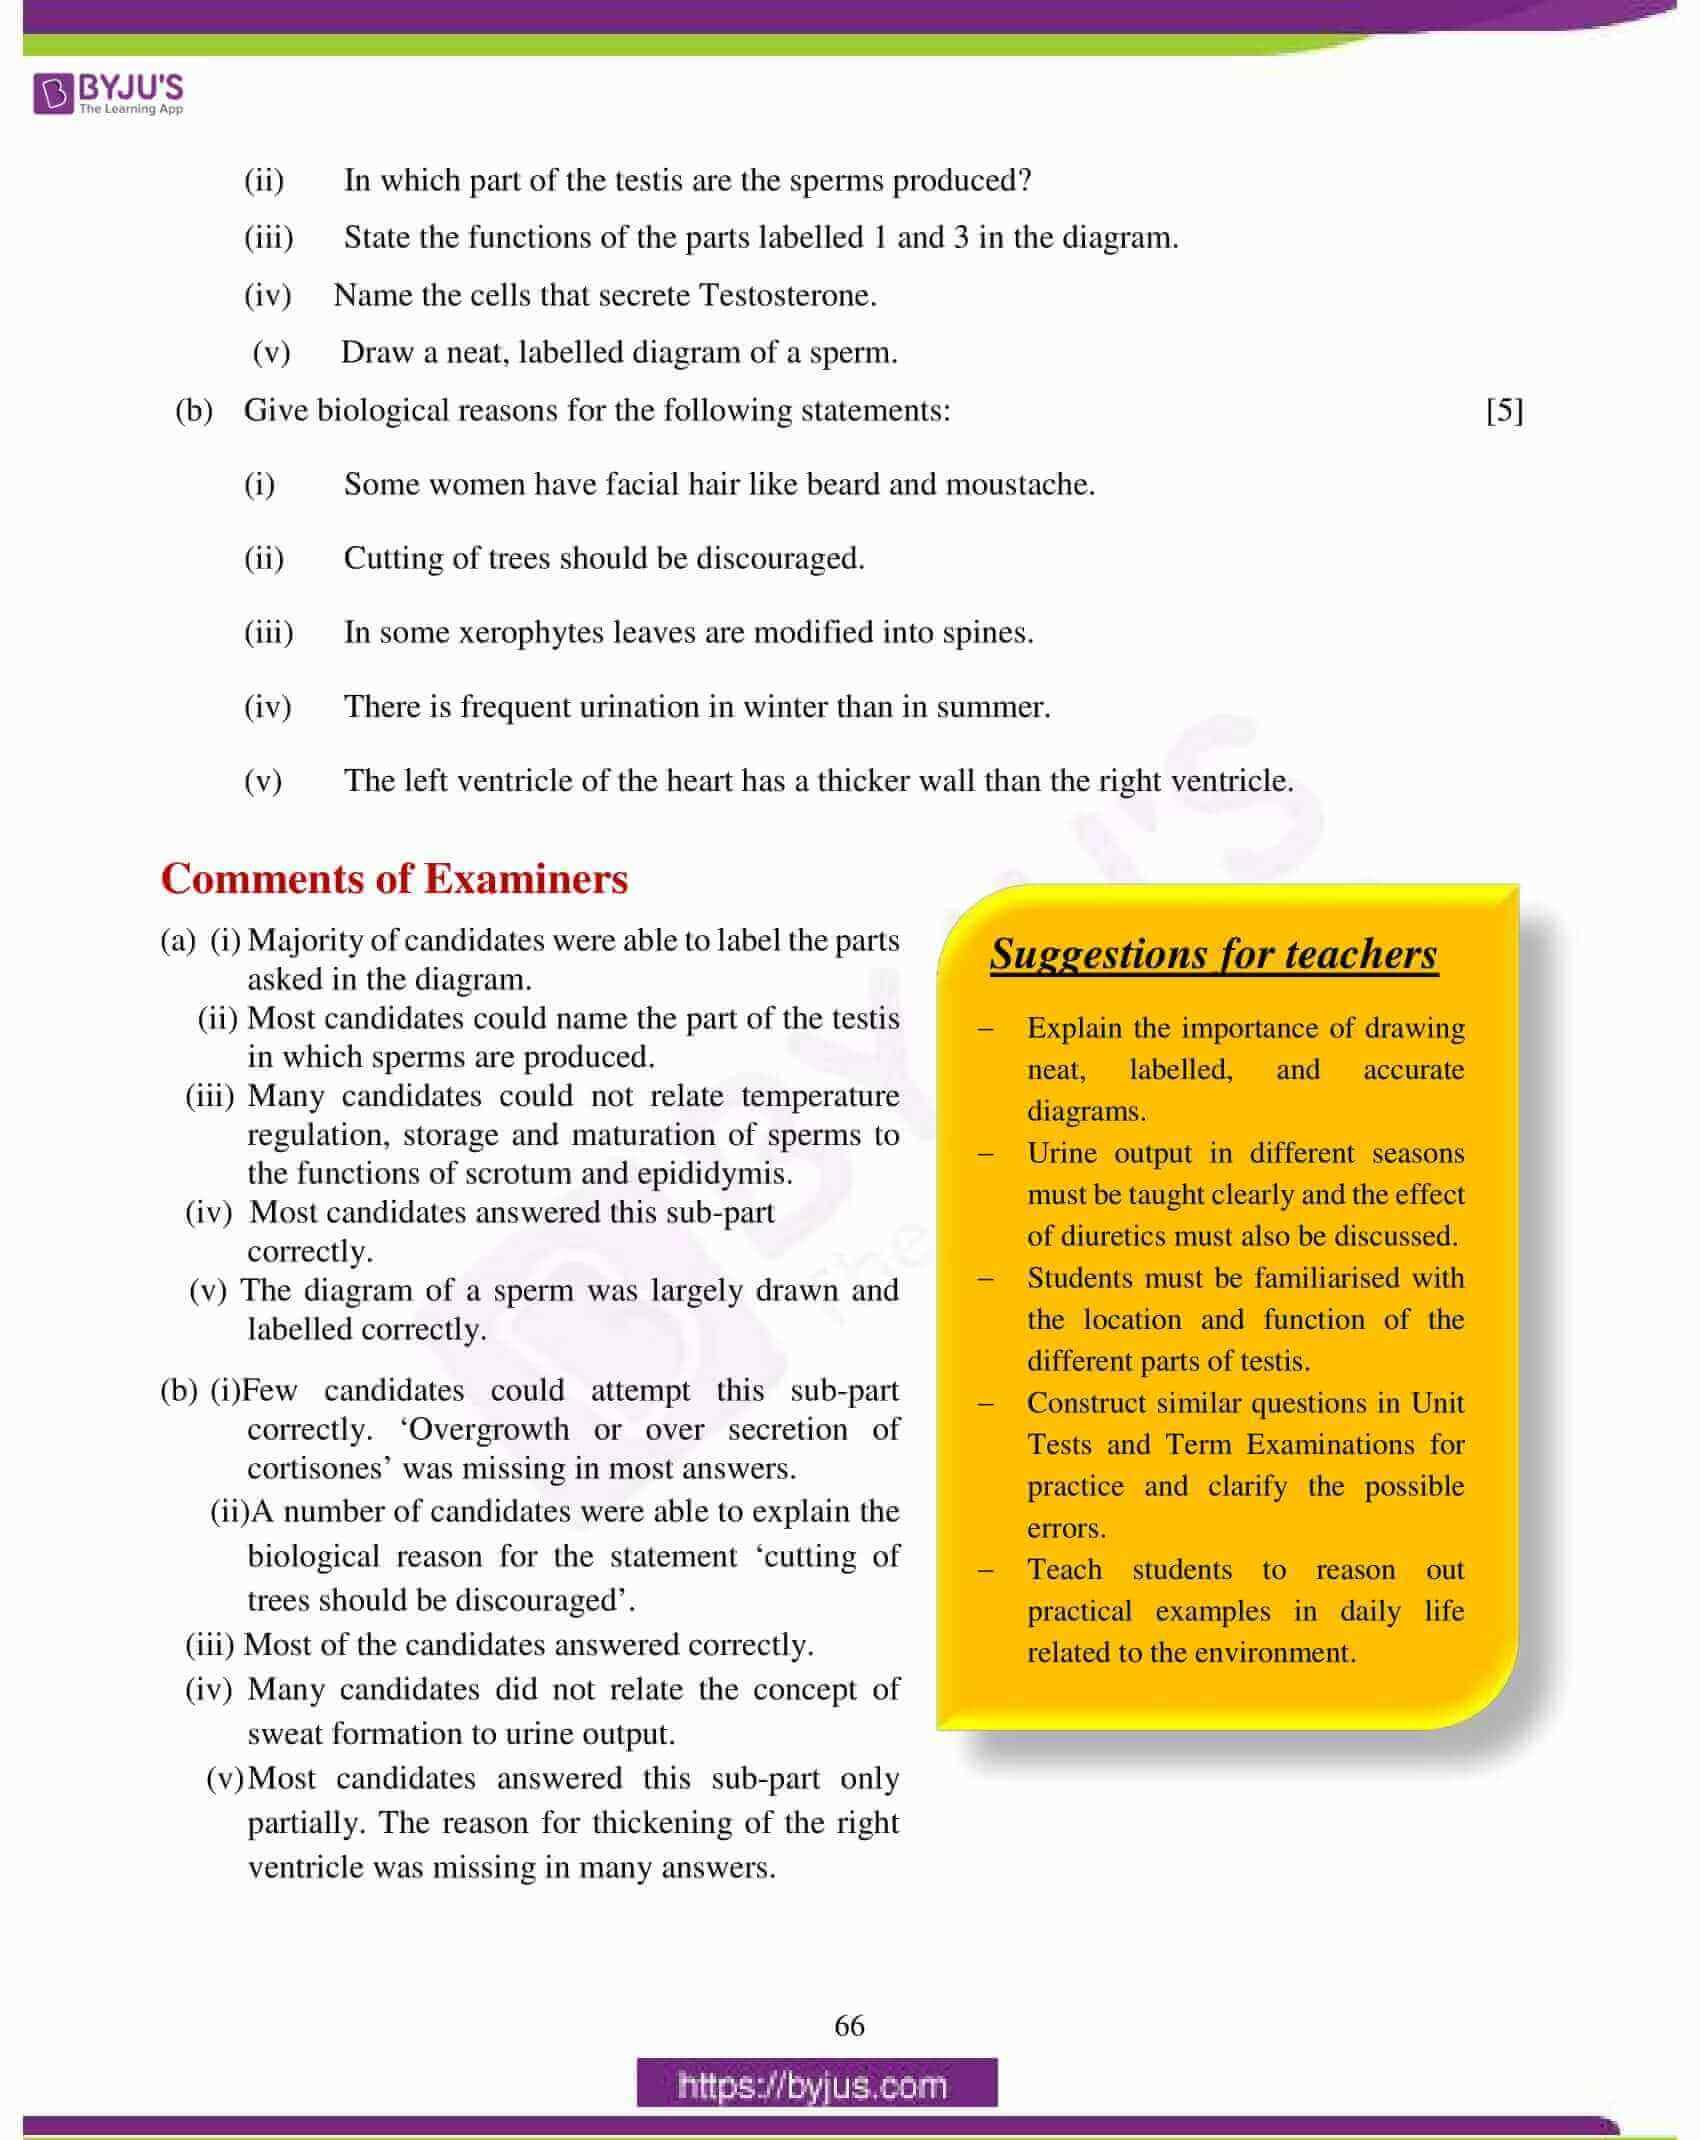 icse class 10 biology question paper solution 2017 16